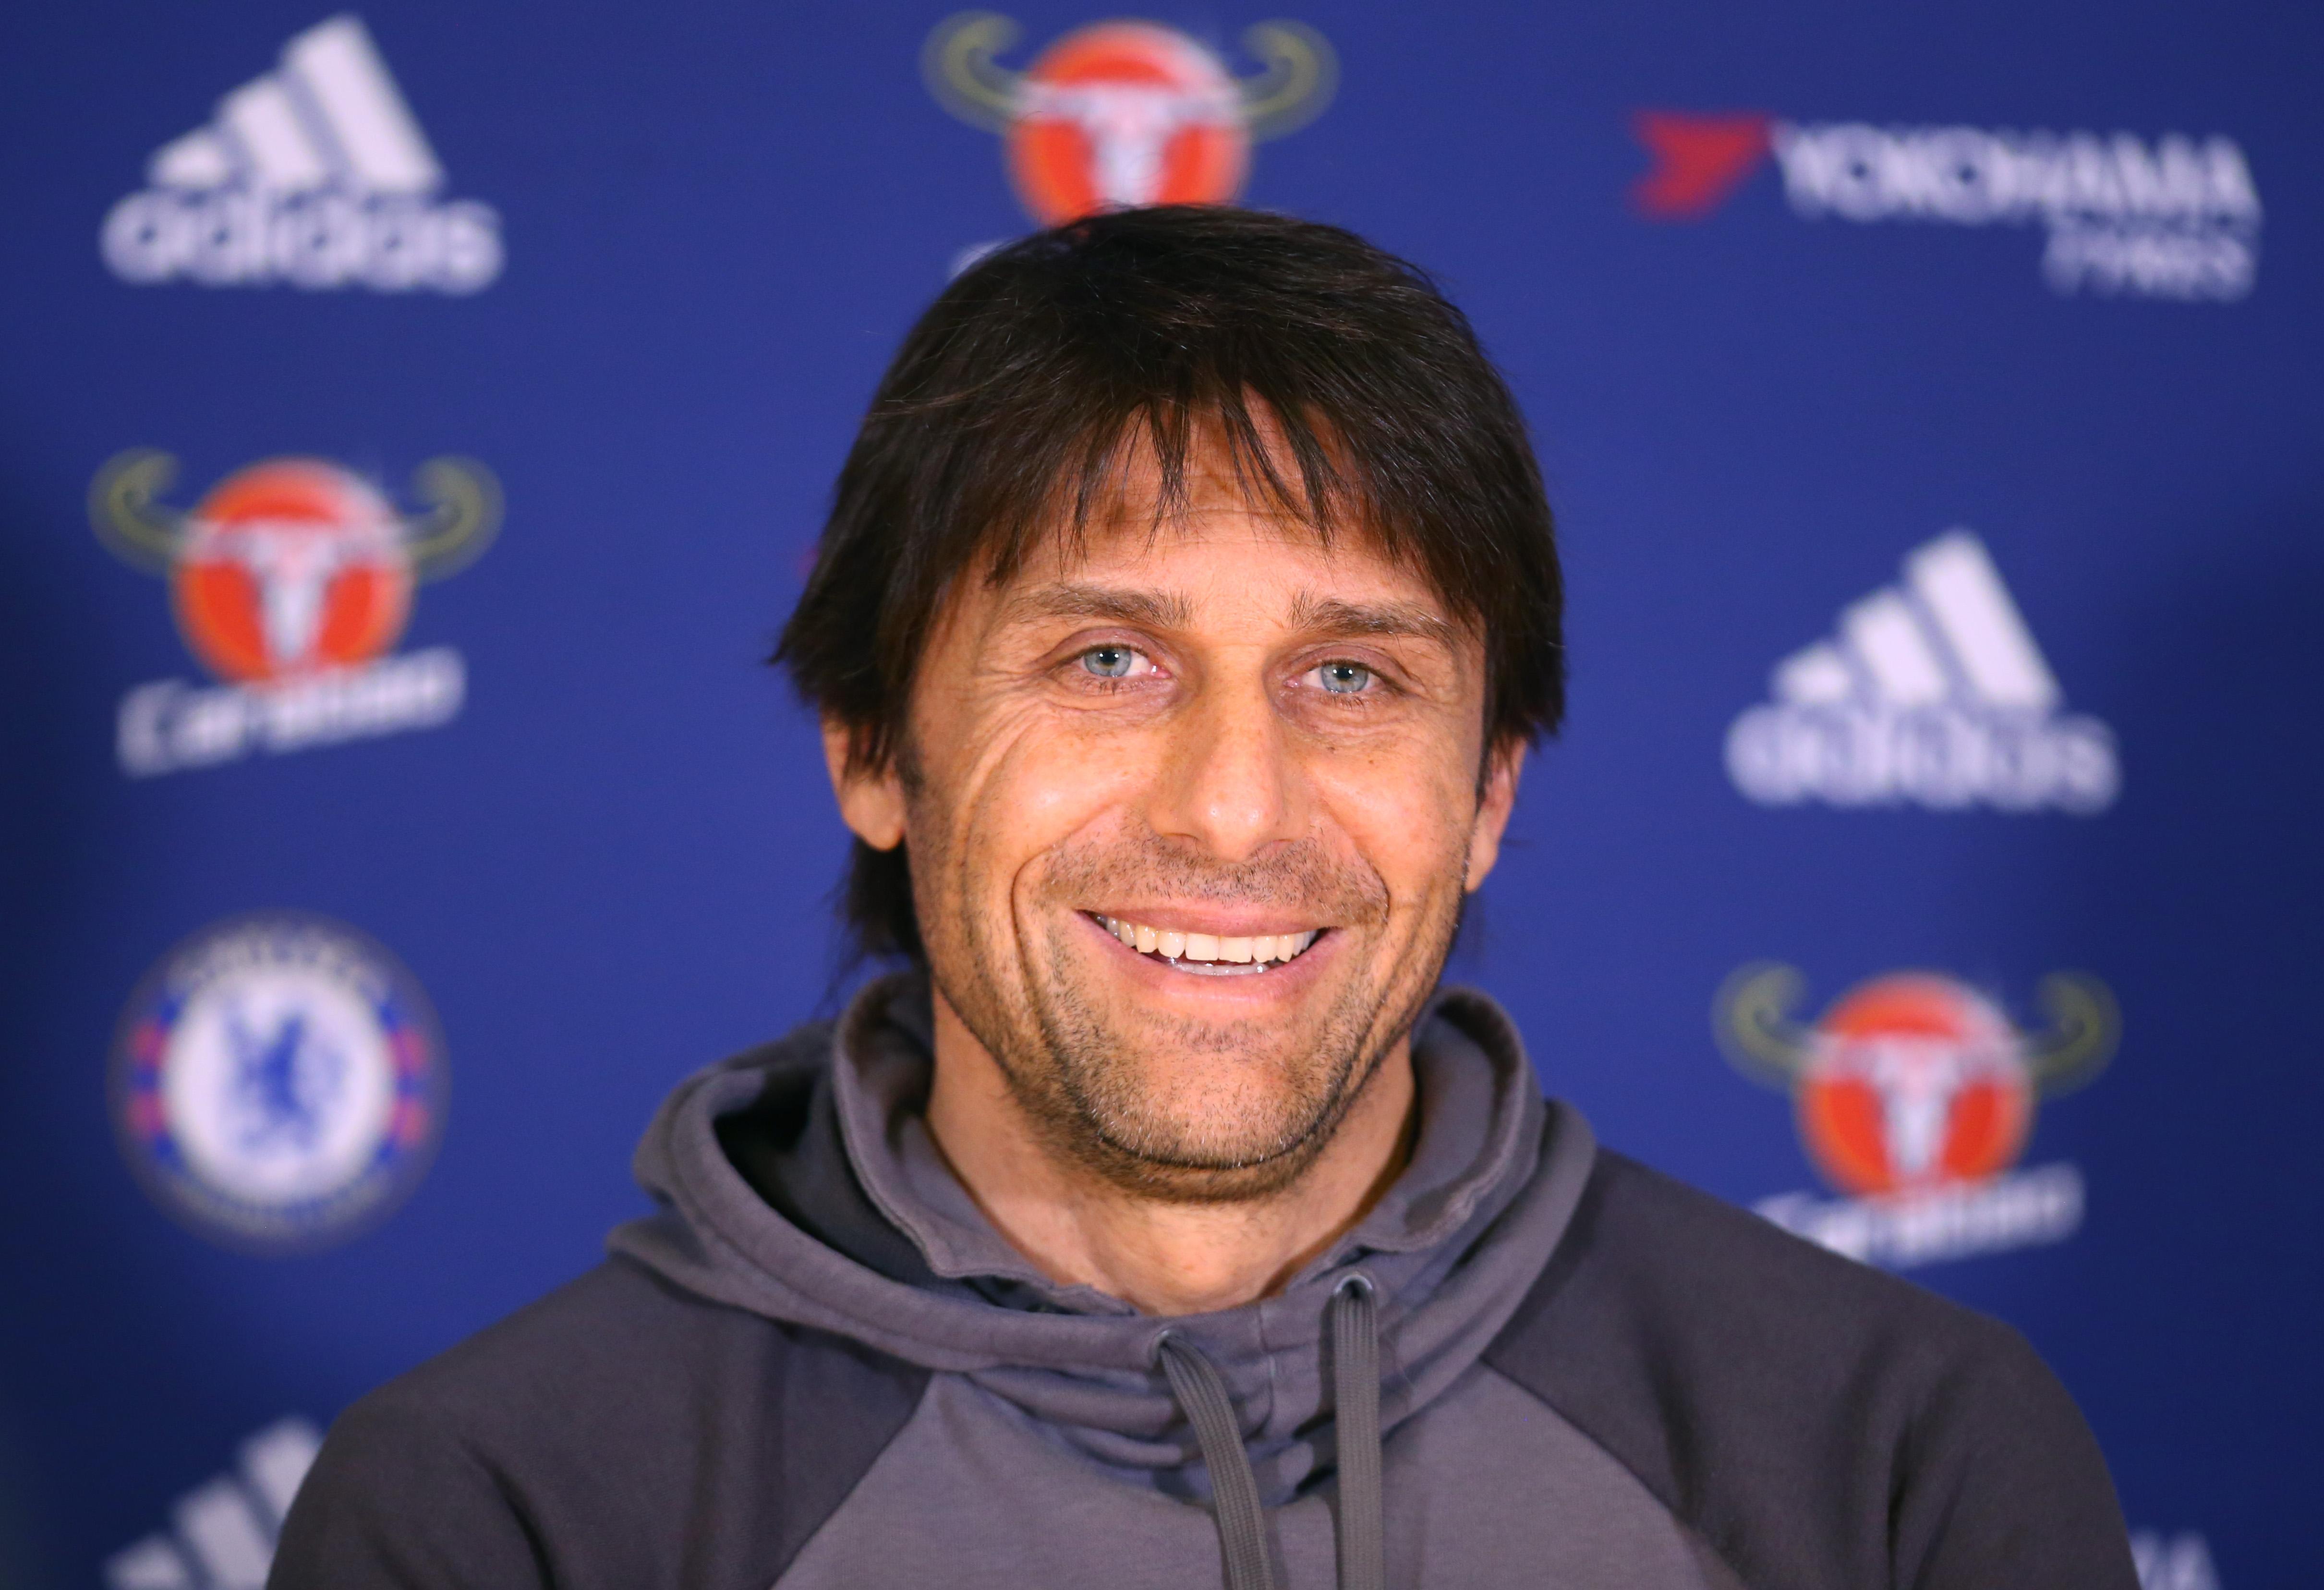 Kasper Schmeichel on Chelsea's radar if Thibaut Courtois joins Real Madrid